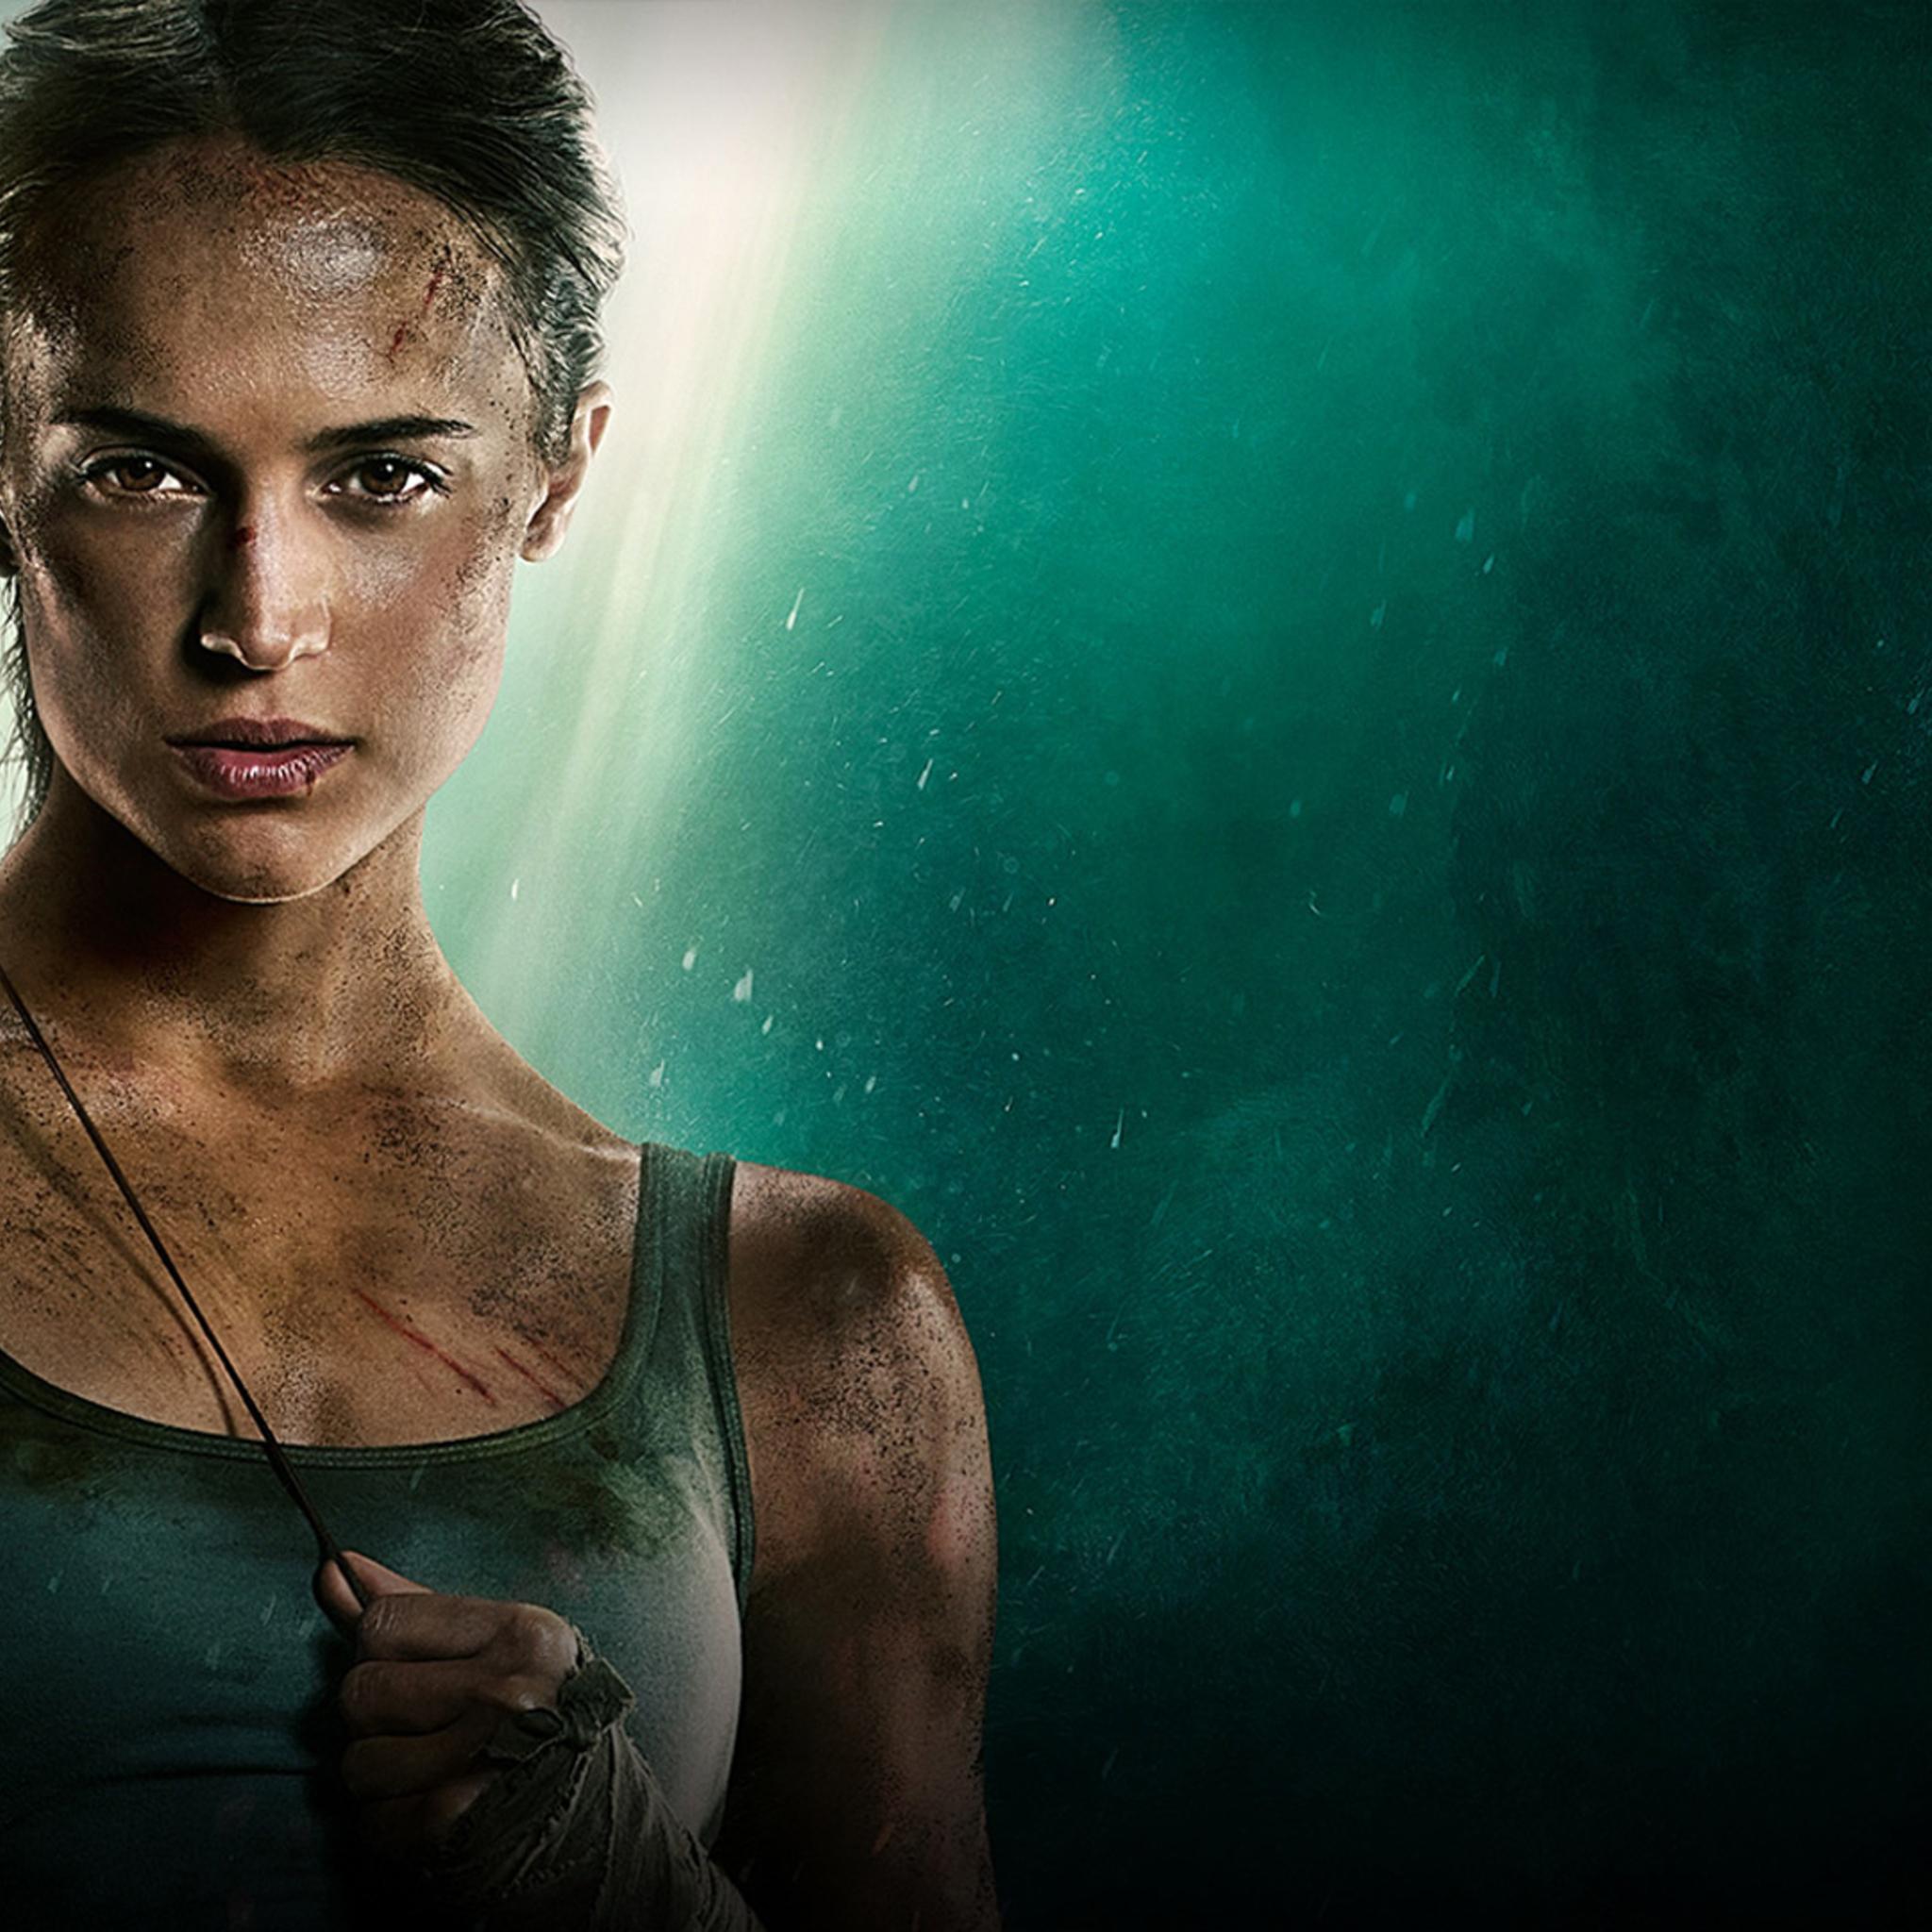 Tomb Raider Wallpaper 1920x1080: 2048x2048 Tomb Raider 2018 Movie Alicia Vikander Poster